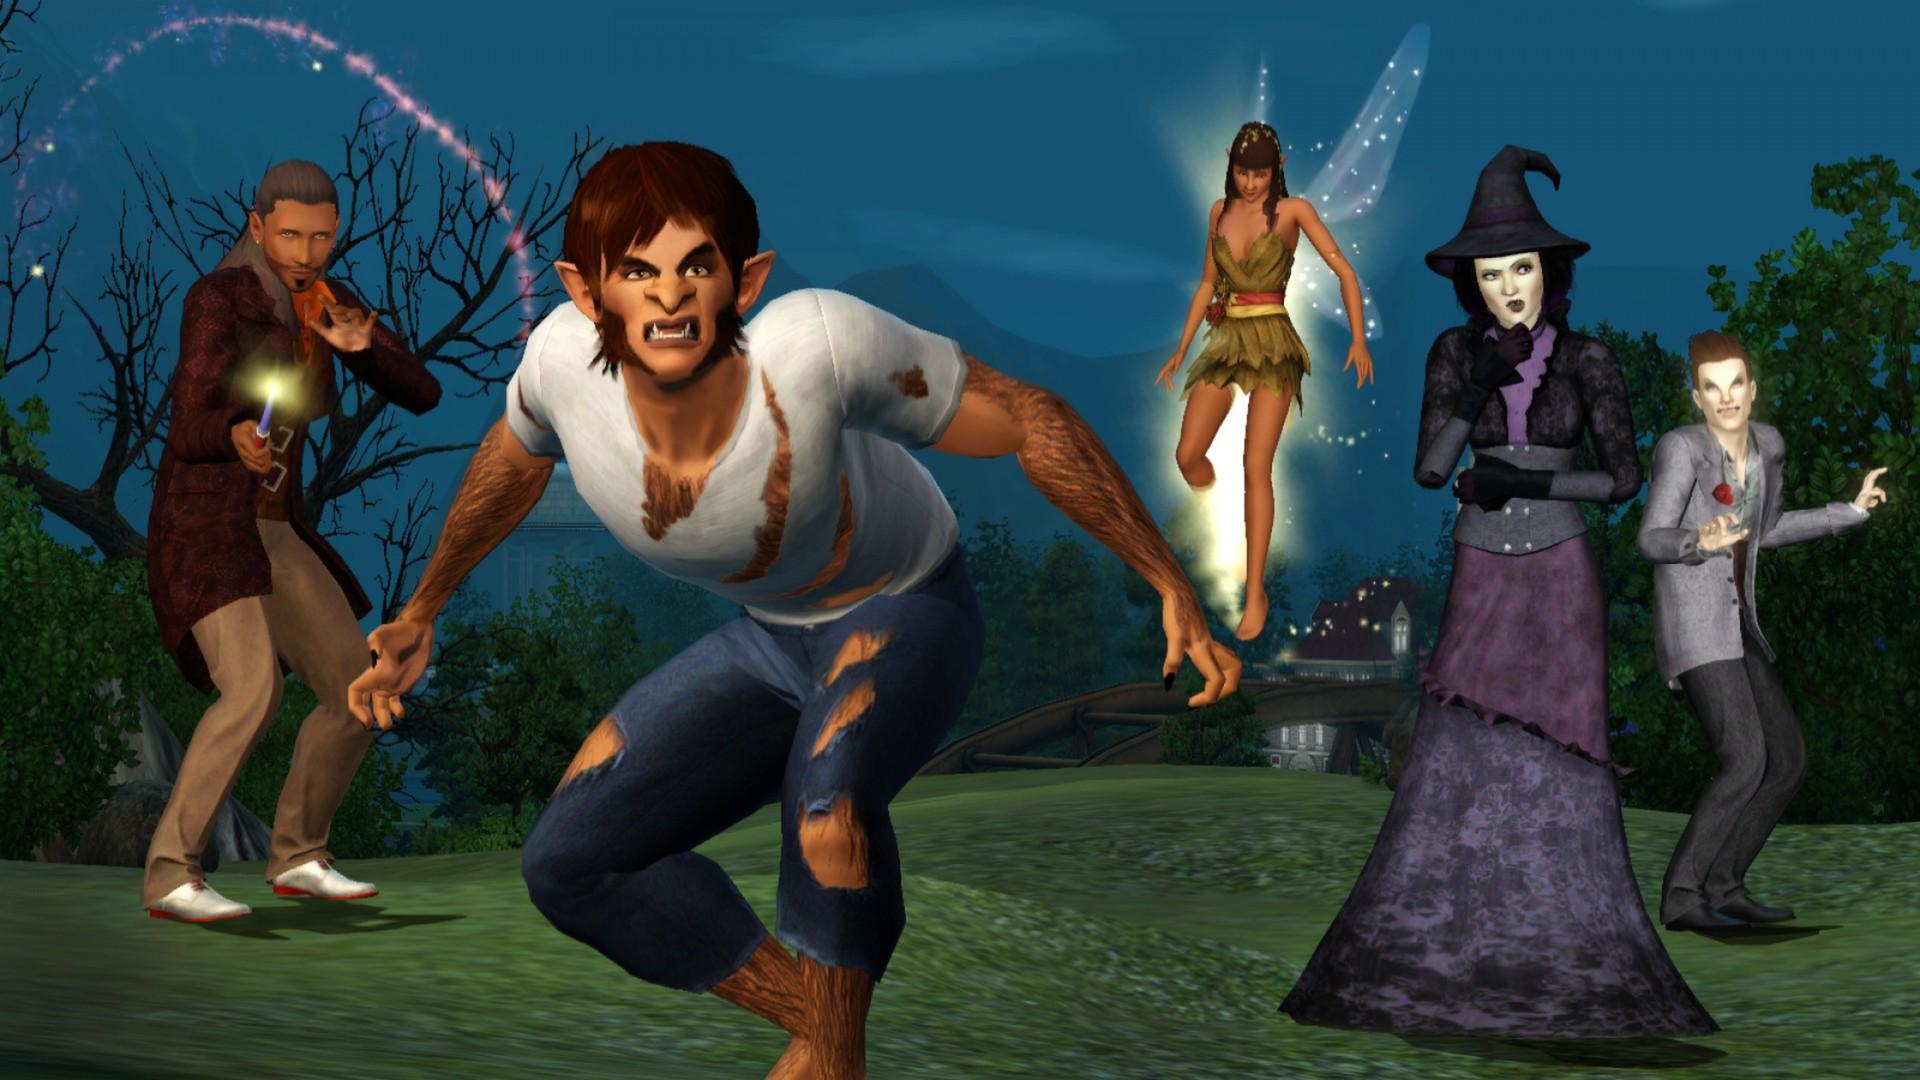 KHAiHOM.com - The Sims 3: Supernatural